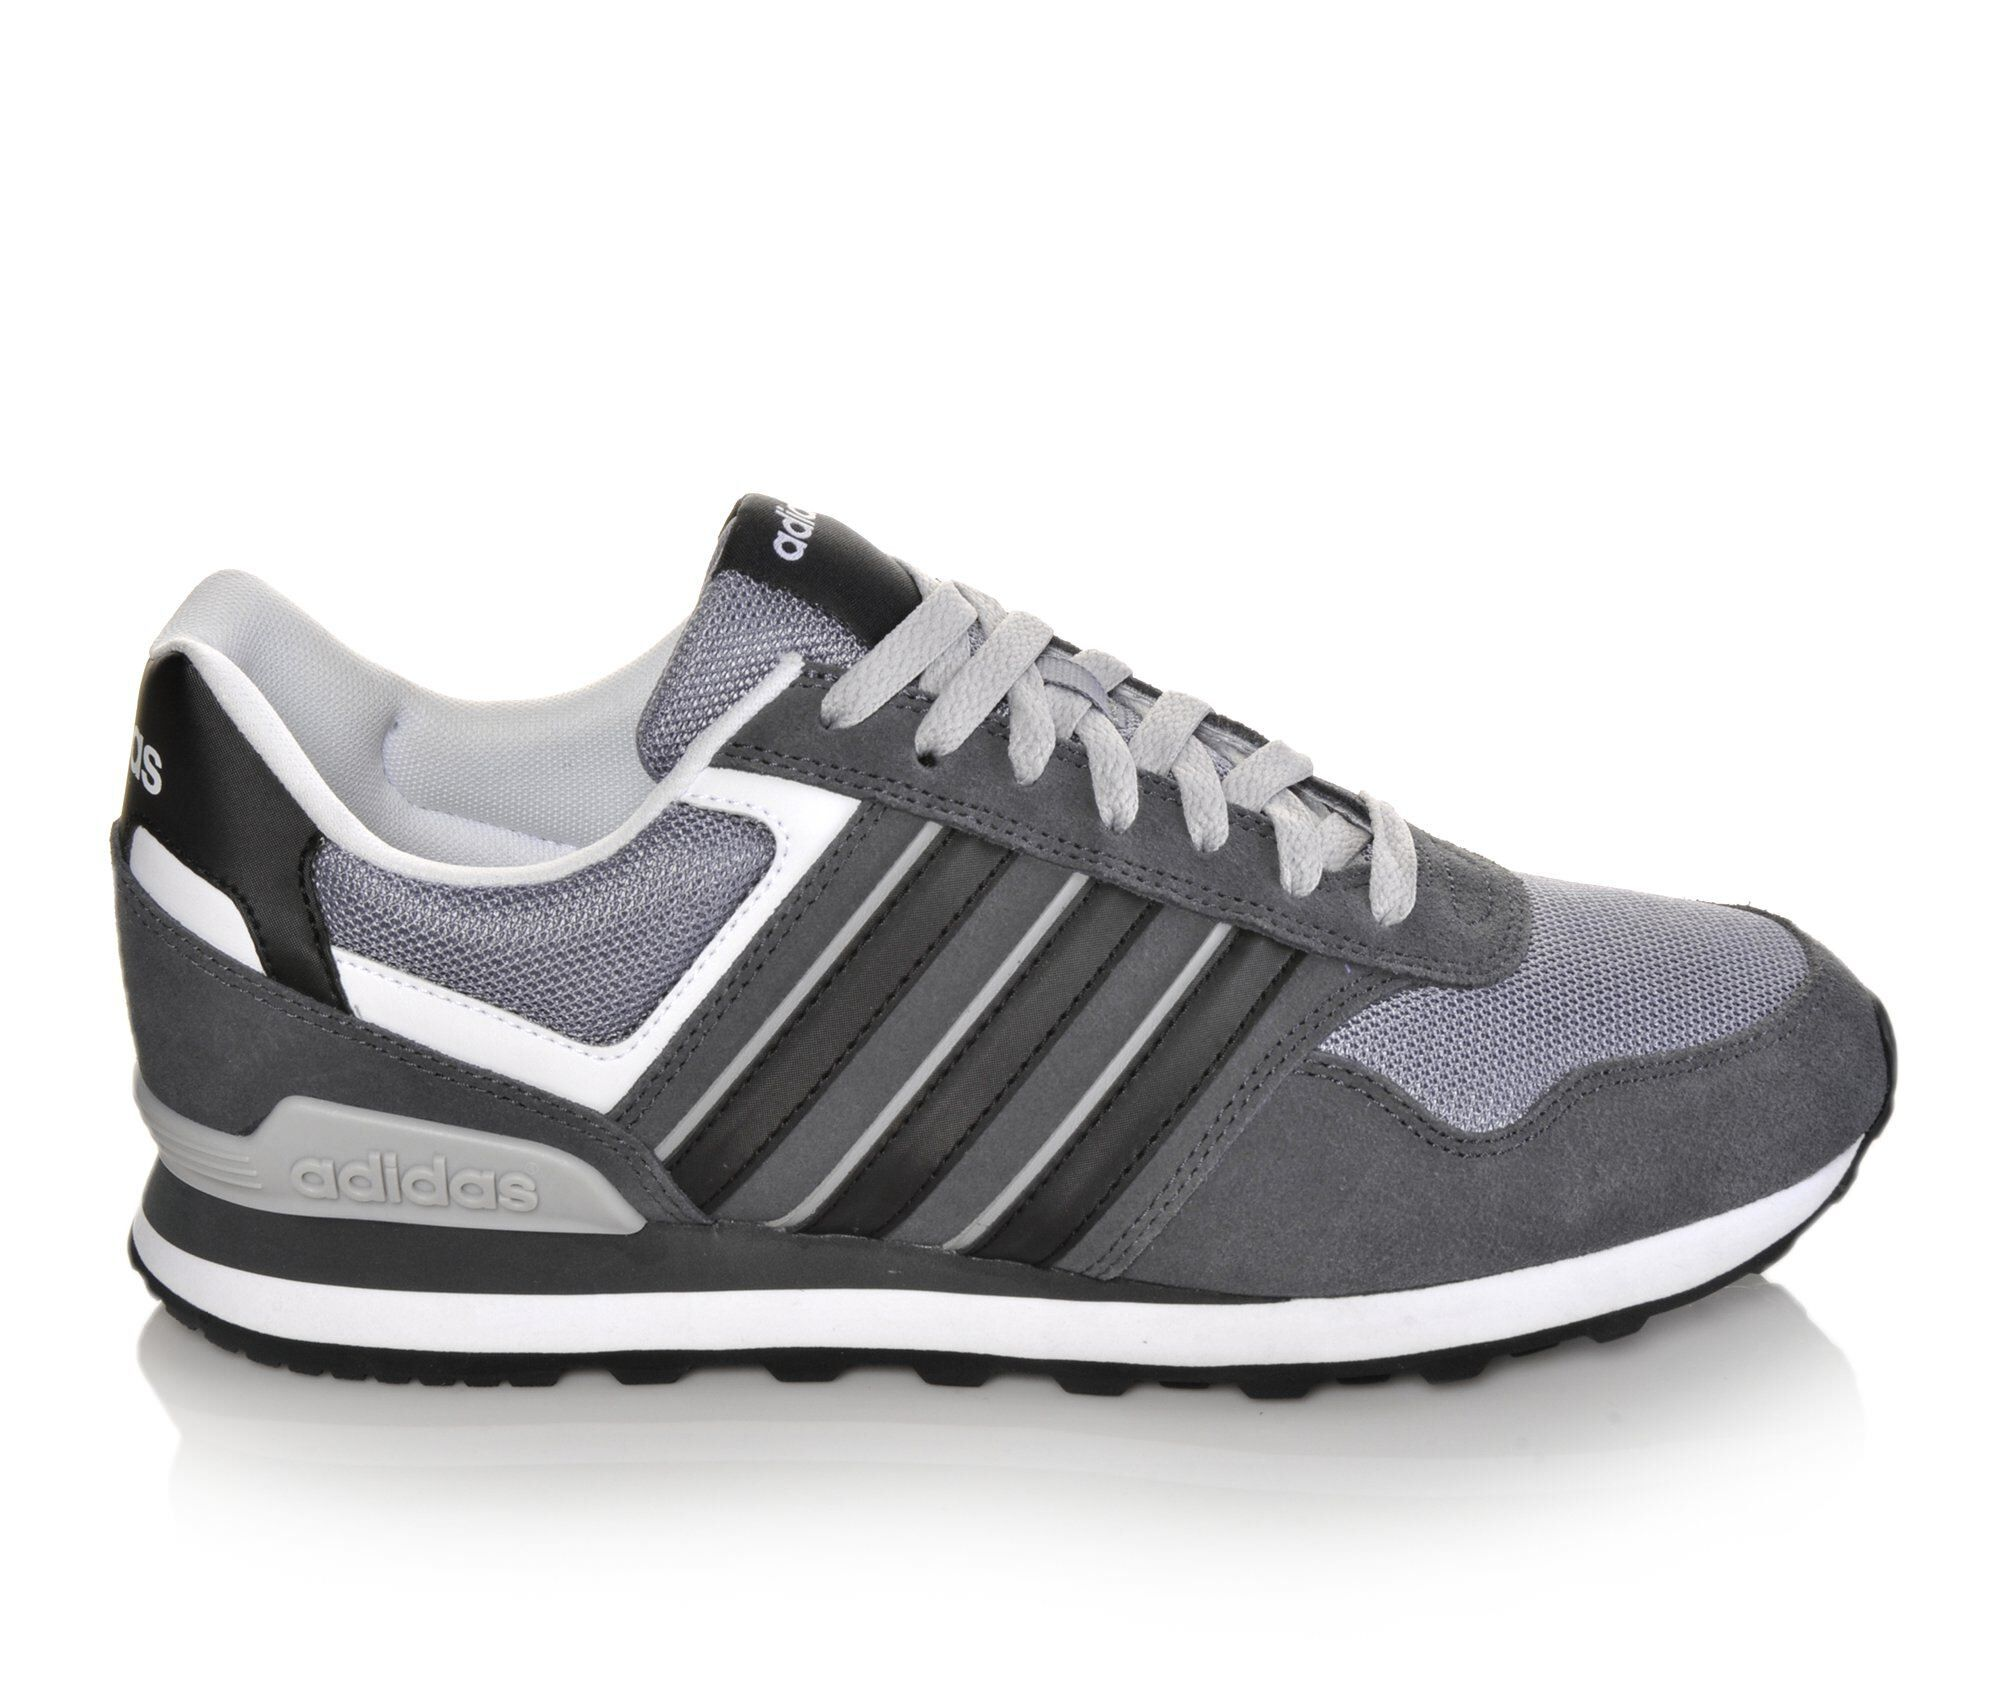 Men Shoes - Adida 10k Grey/Black/White E64OBBHI